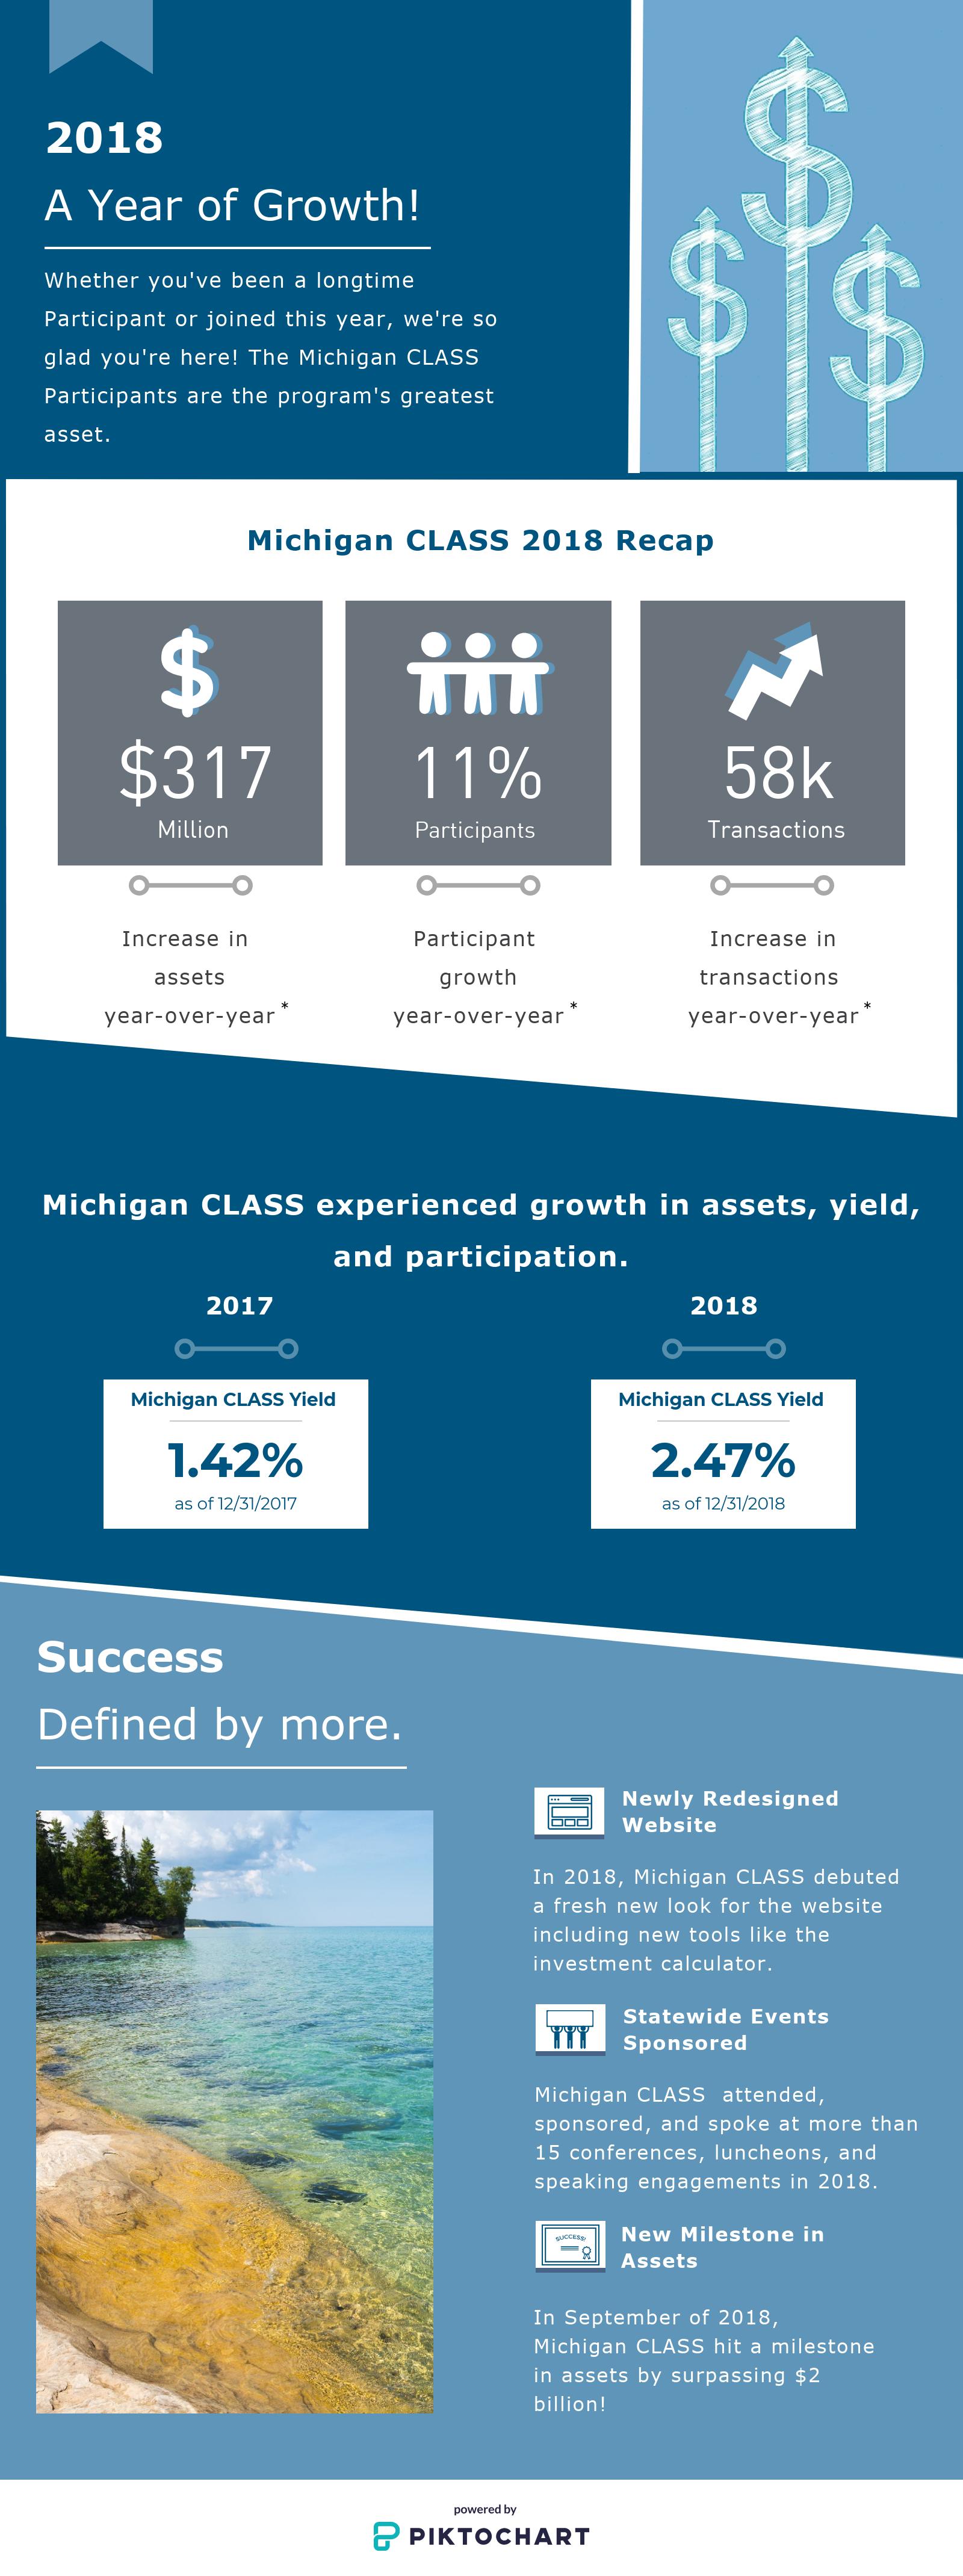 02.19 - Michigan CLASS Investor